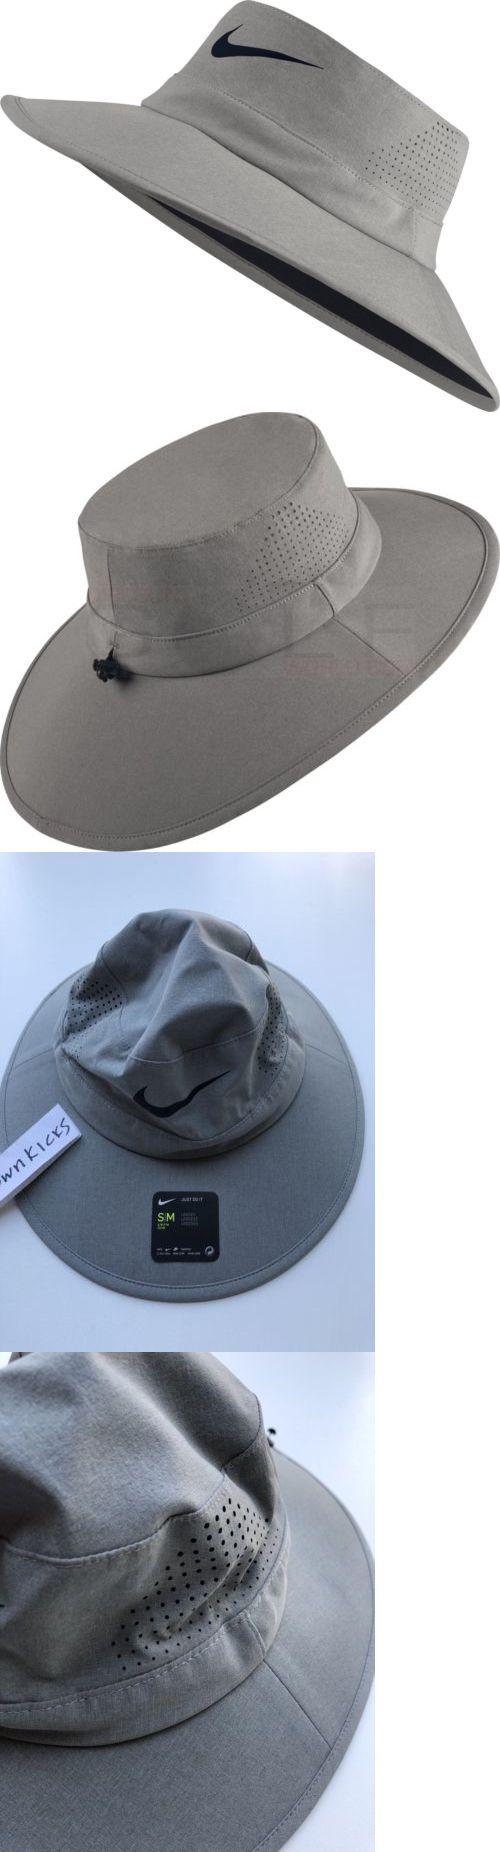 97482d7ceb1 Hats 52365: Nike Golf Uv Sun Protect 2.0 Bucket Hat Grey 832687 063 ...